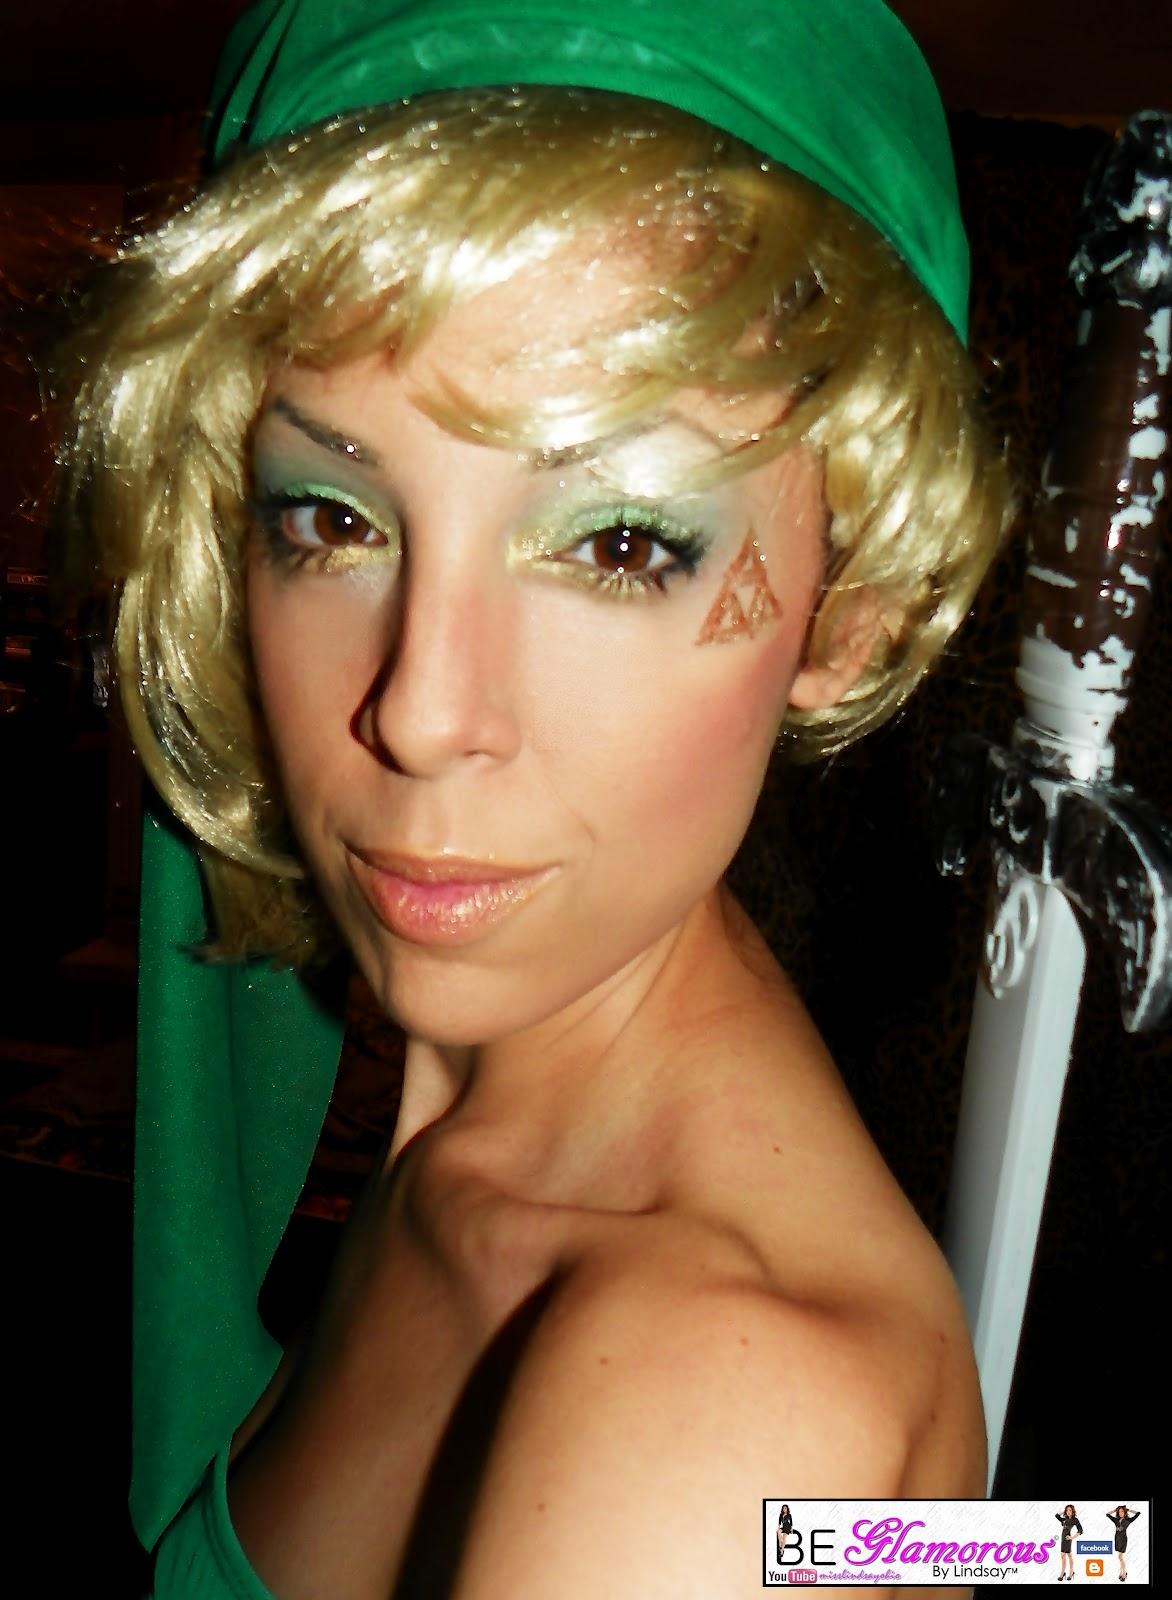 By lindsay legend of zelda link character makeup and costume